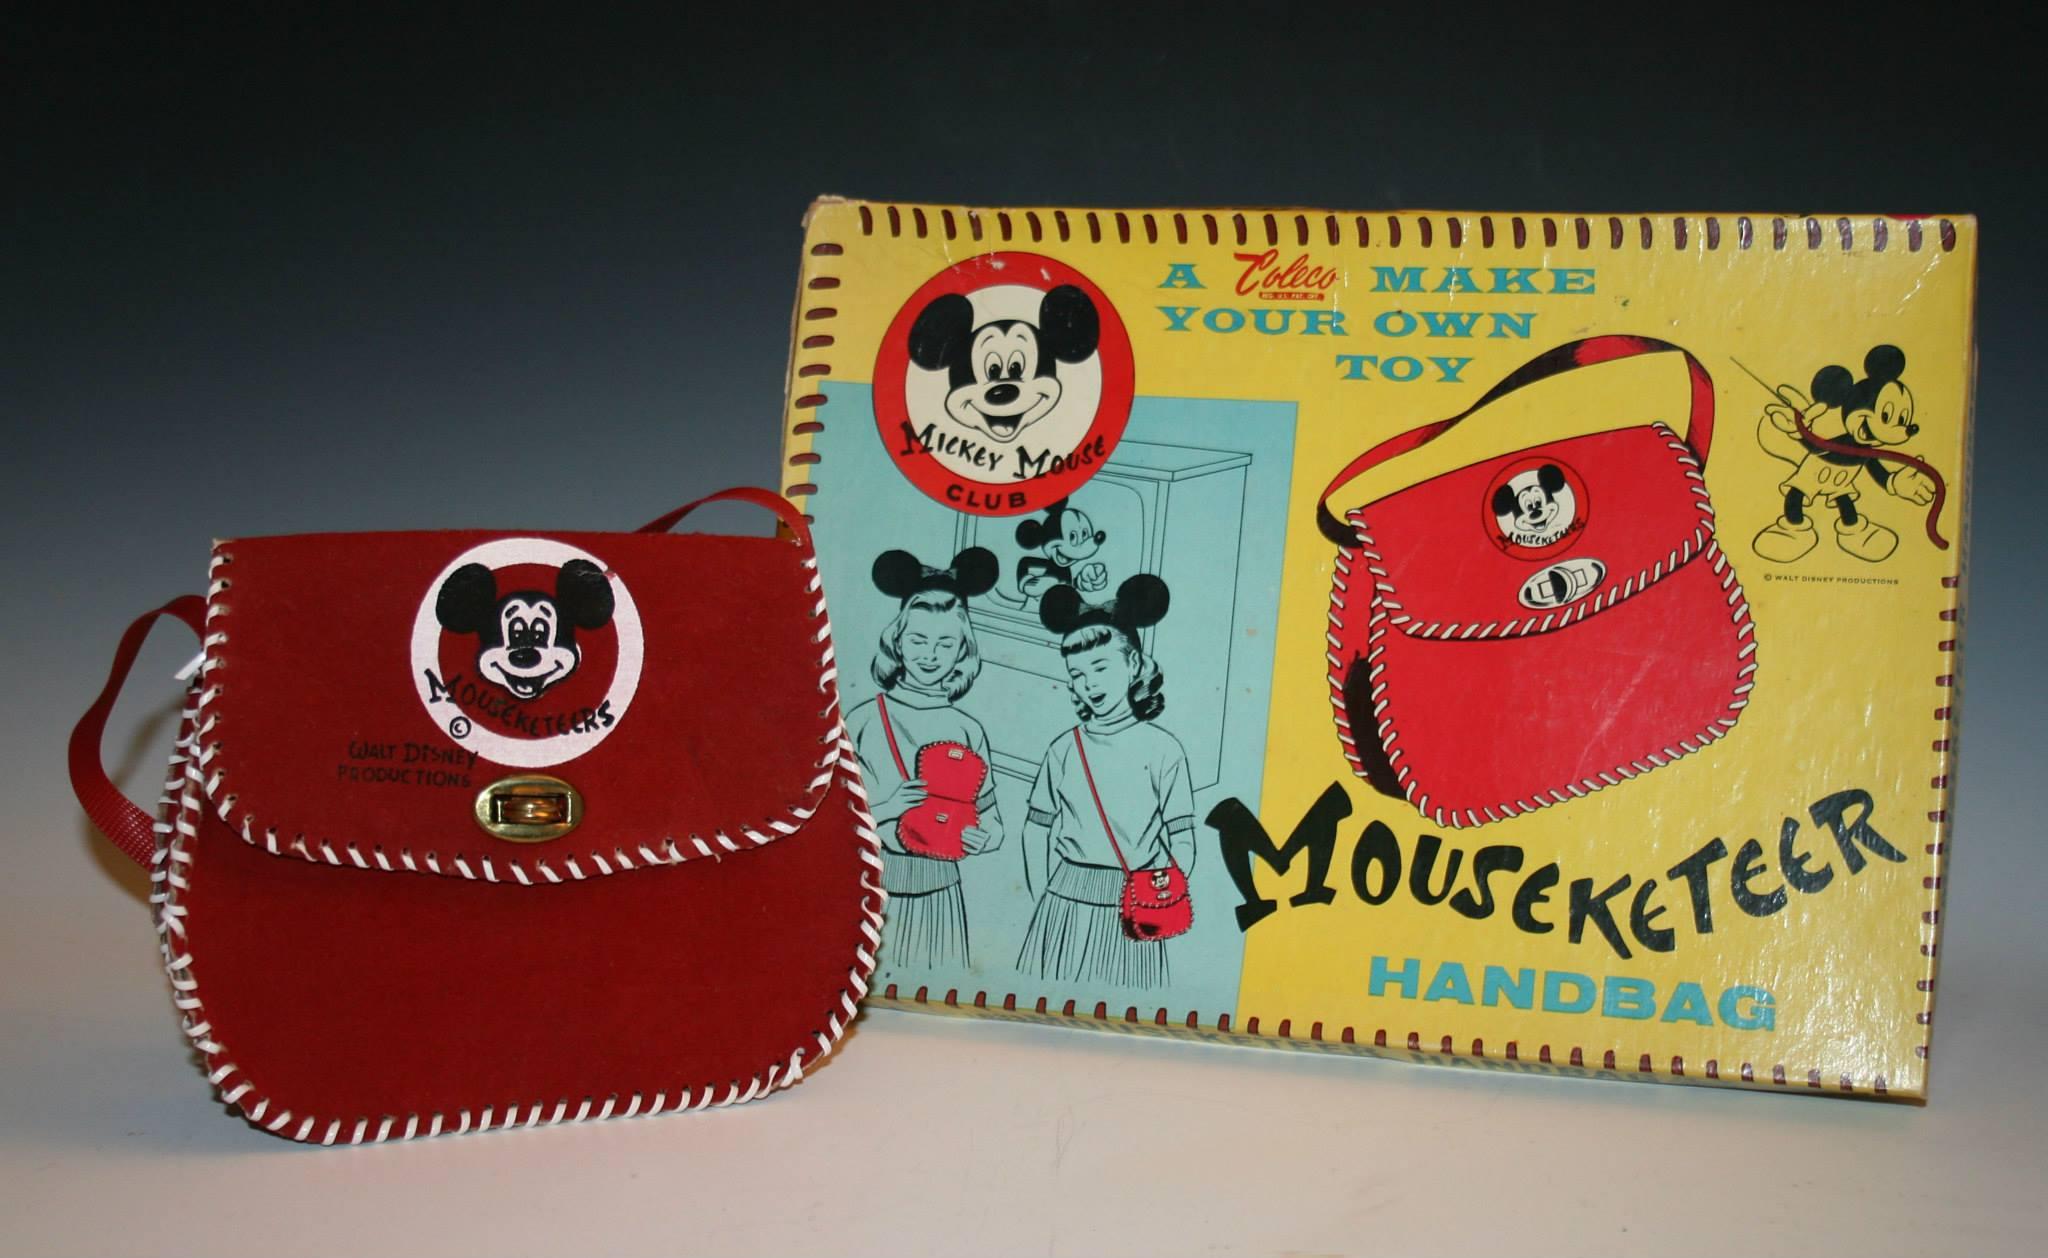 Mouseketeer Handbag